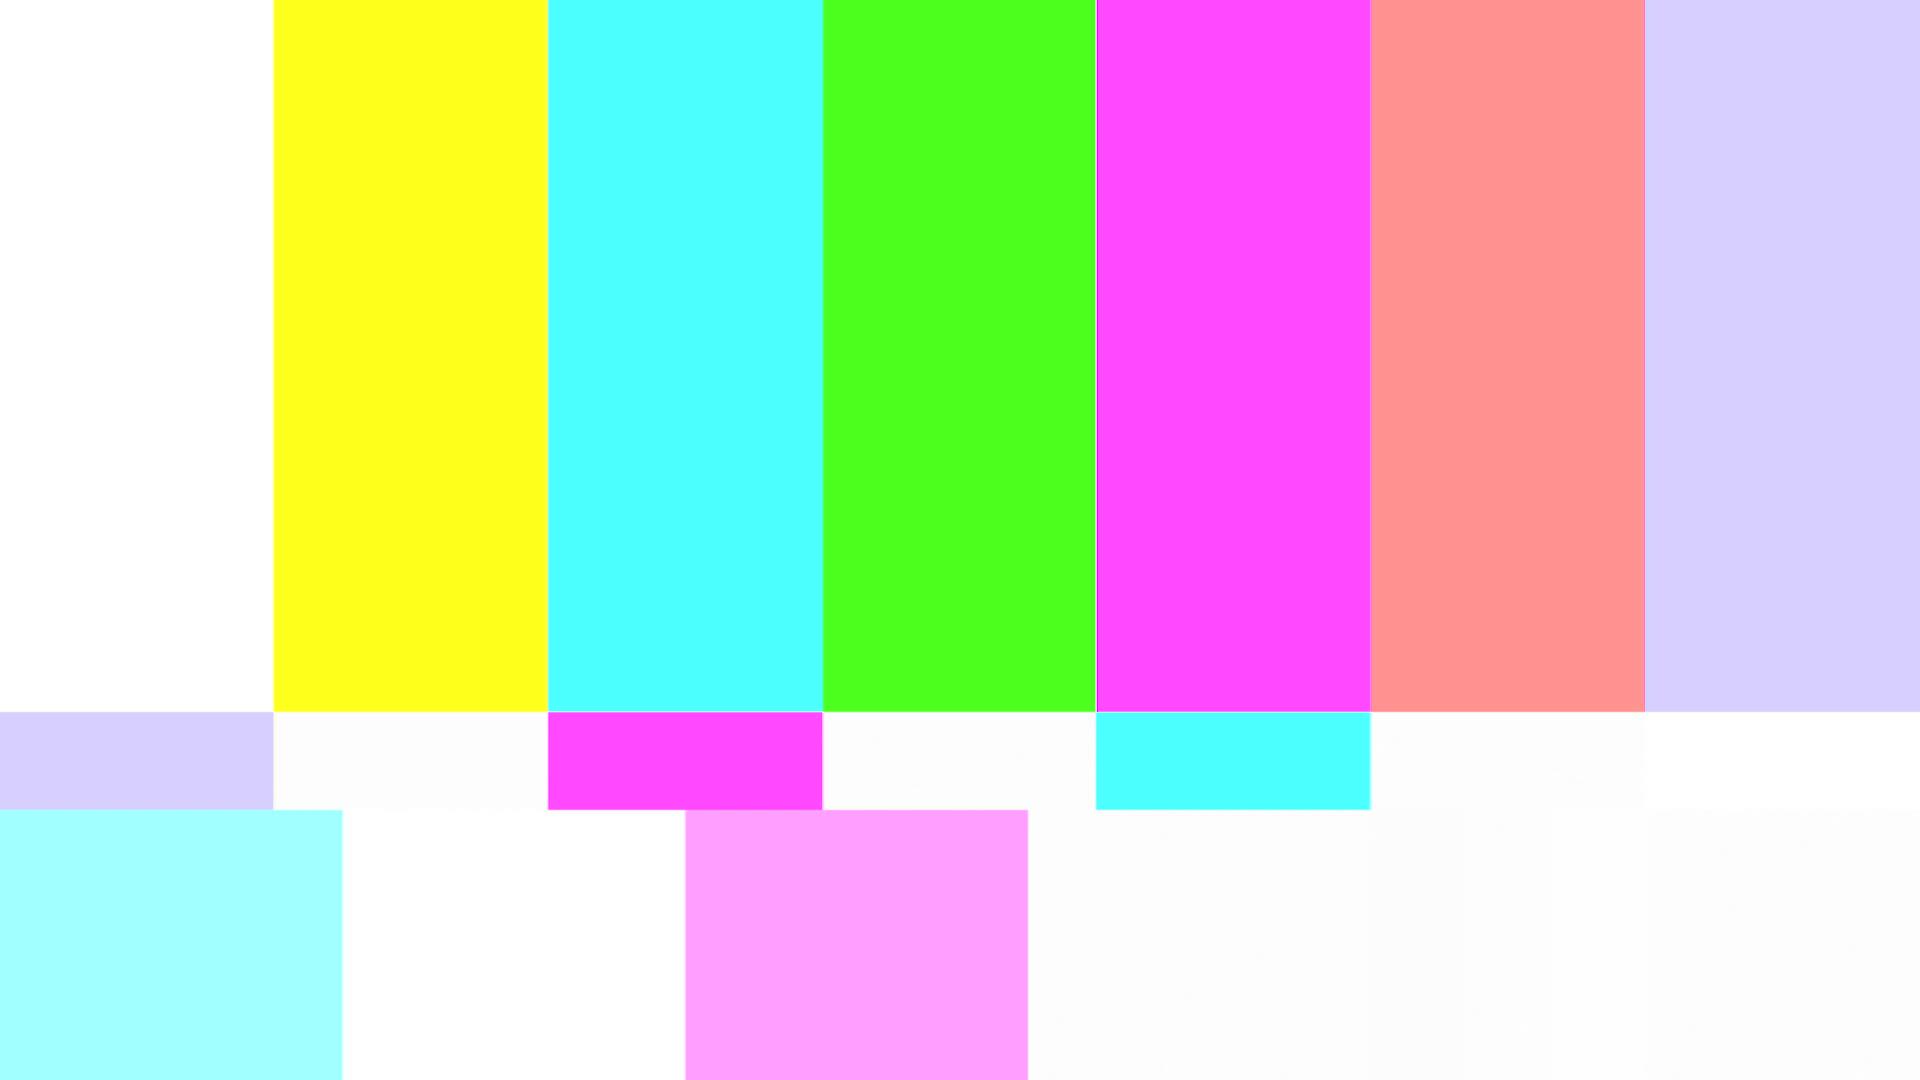 Funny Twitch clips, Funny video, Greek, Greek RAGE, GreekGodx, LivestreamFail, LivestreamFails, TWITCH Recap, Twitch, Twitch clips, Twitch highlights, XQC, funnymemes, greek slams desk, livestream, resident evil 2, sodapoppin, streamer fail, twitch moments, twitchgirls, GREEK RAGES AND SLAMS DESK! W/CHAT | TWITCH RECAP #8 GIFs